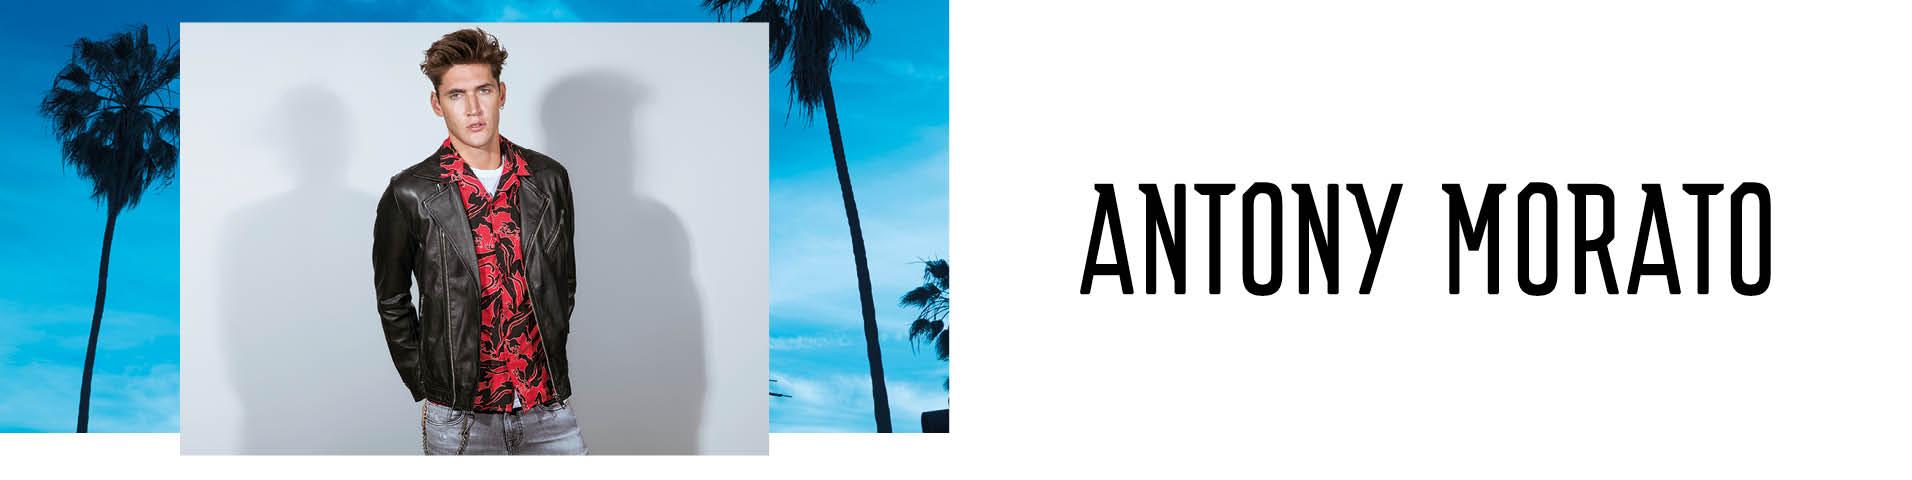 d1d402d6e50b1 Catalogo Antony Morato · Uomo